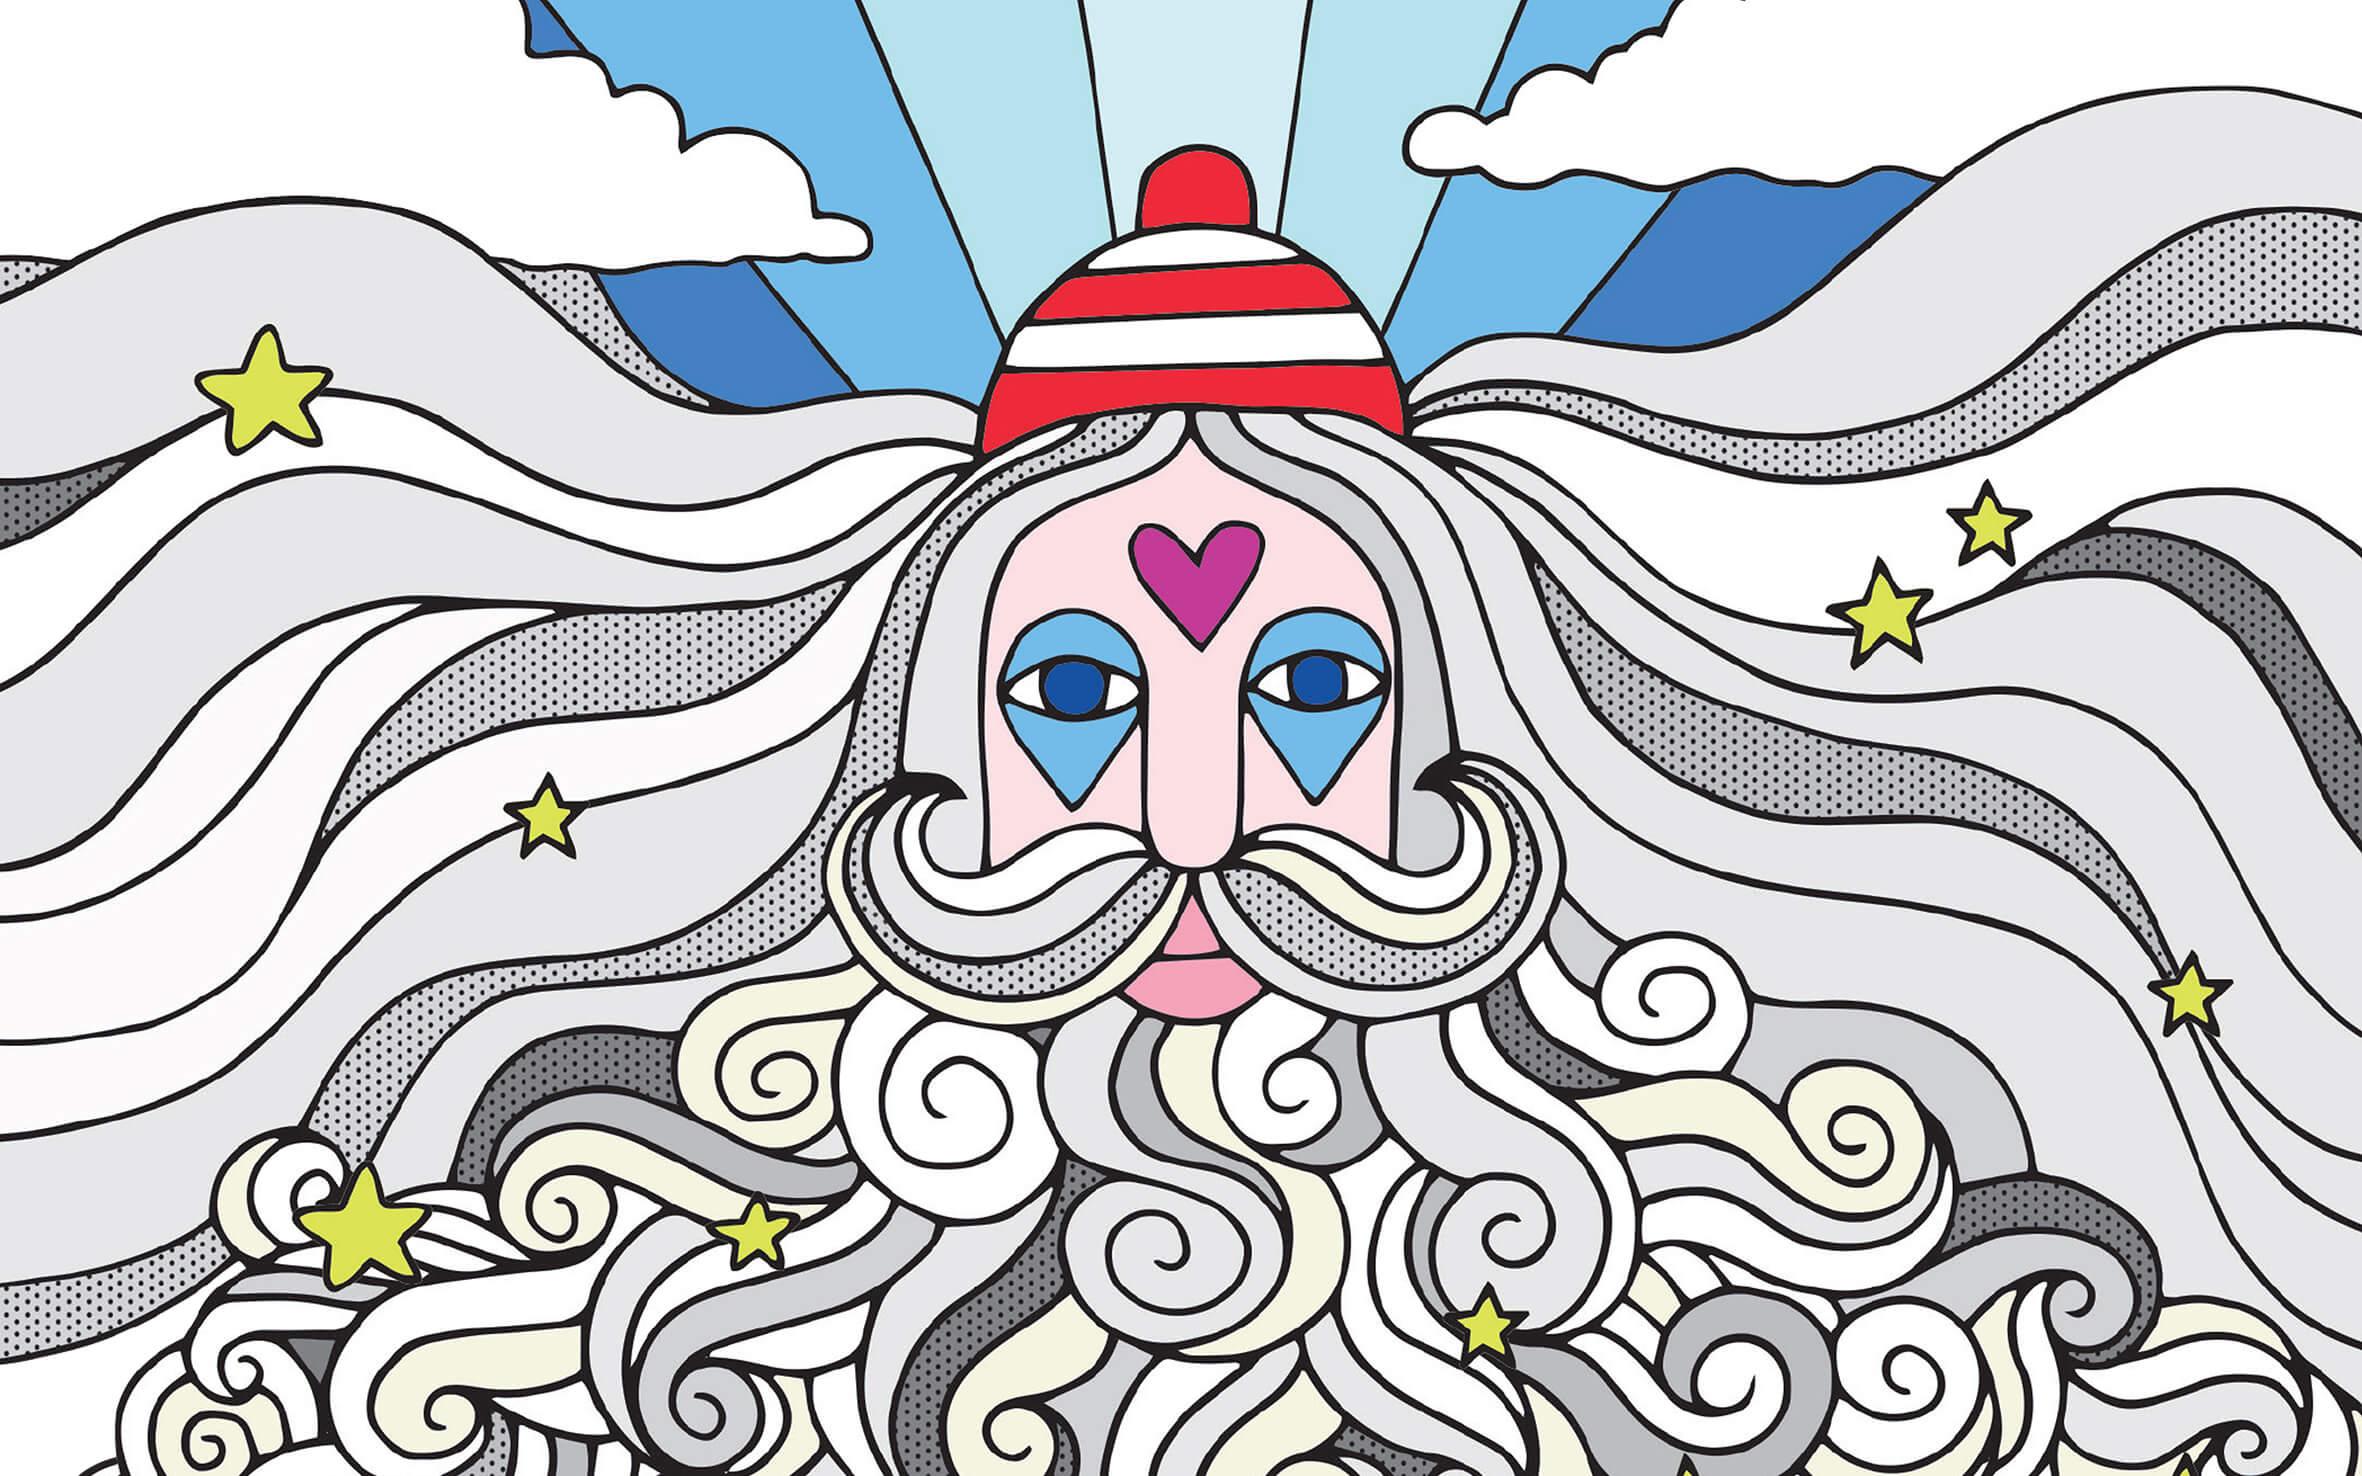 Illustration — Daisy Kennedy Illustration & Graphic Design